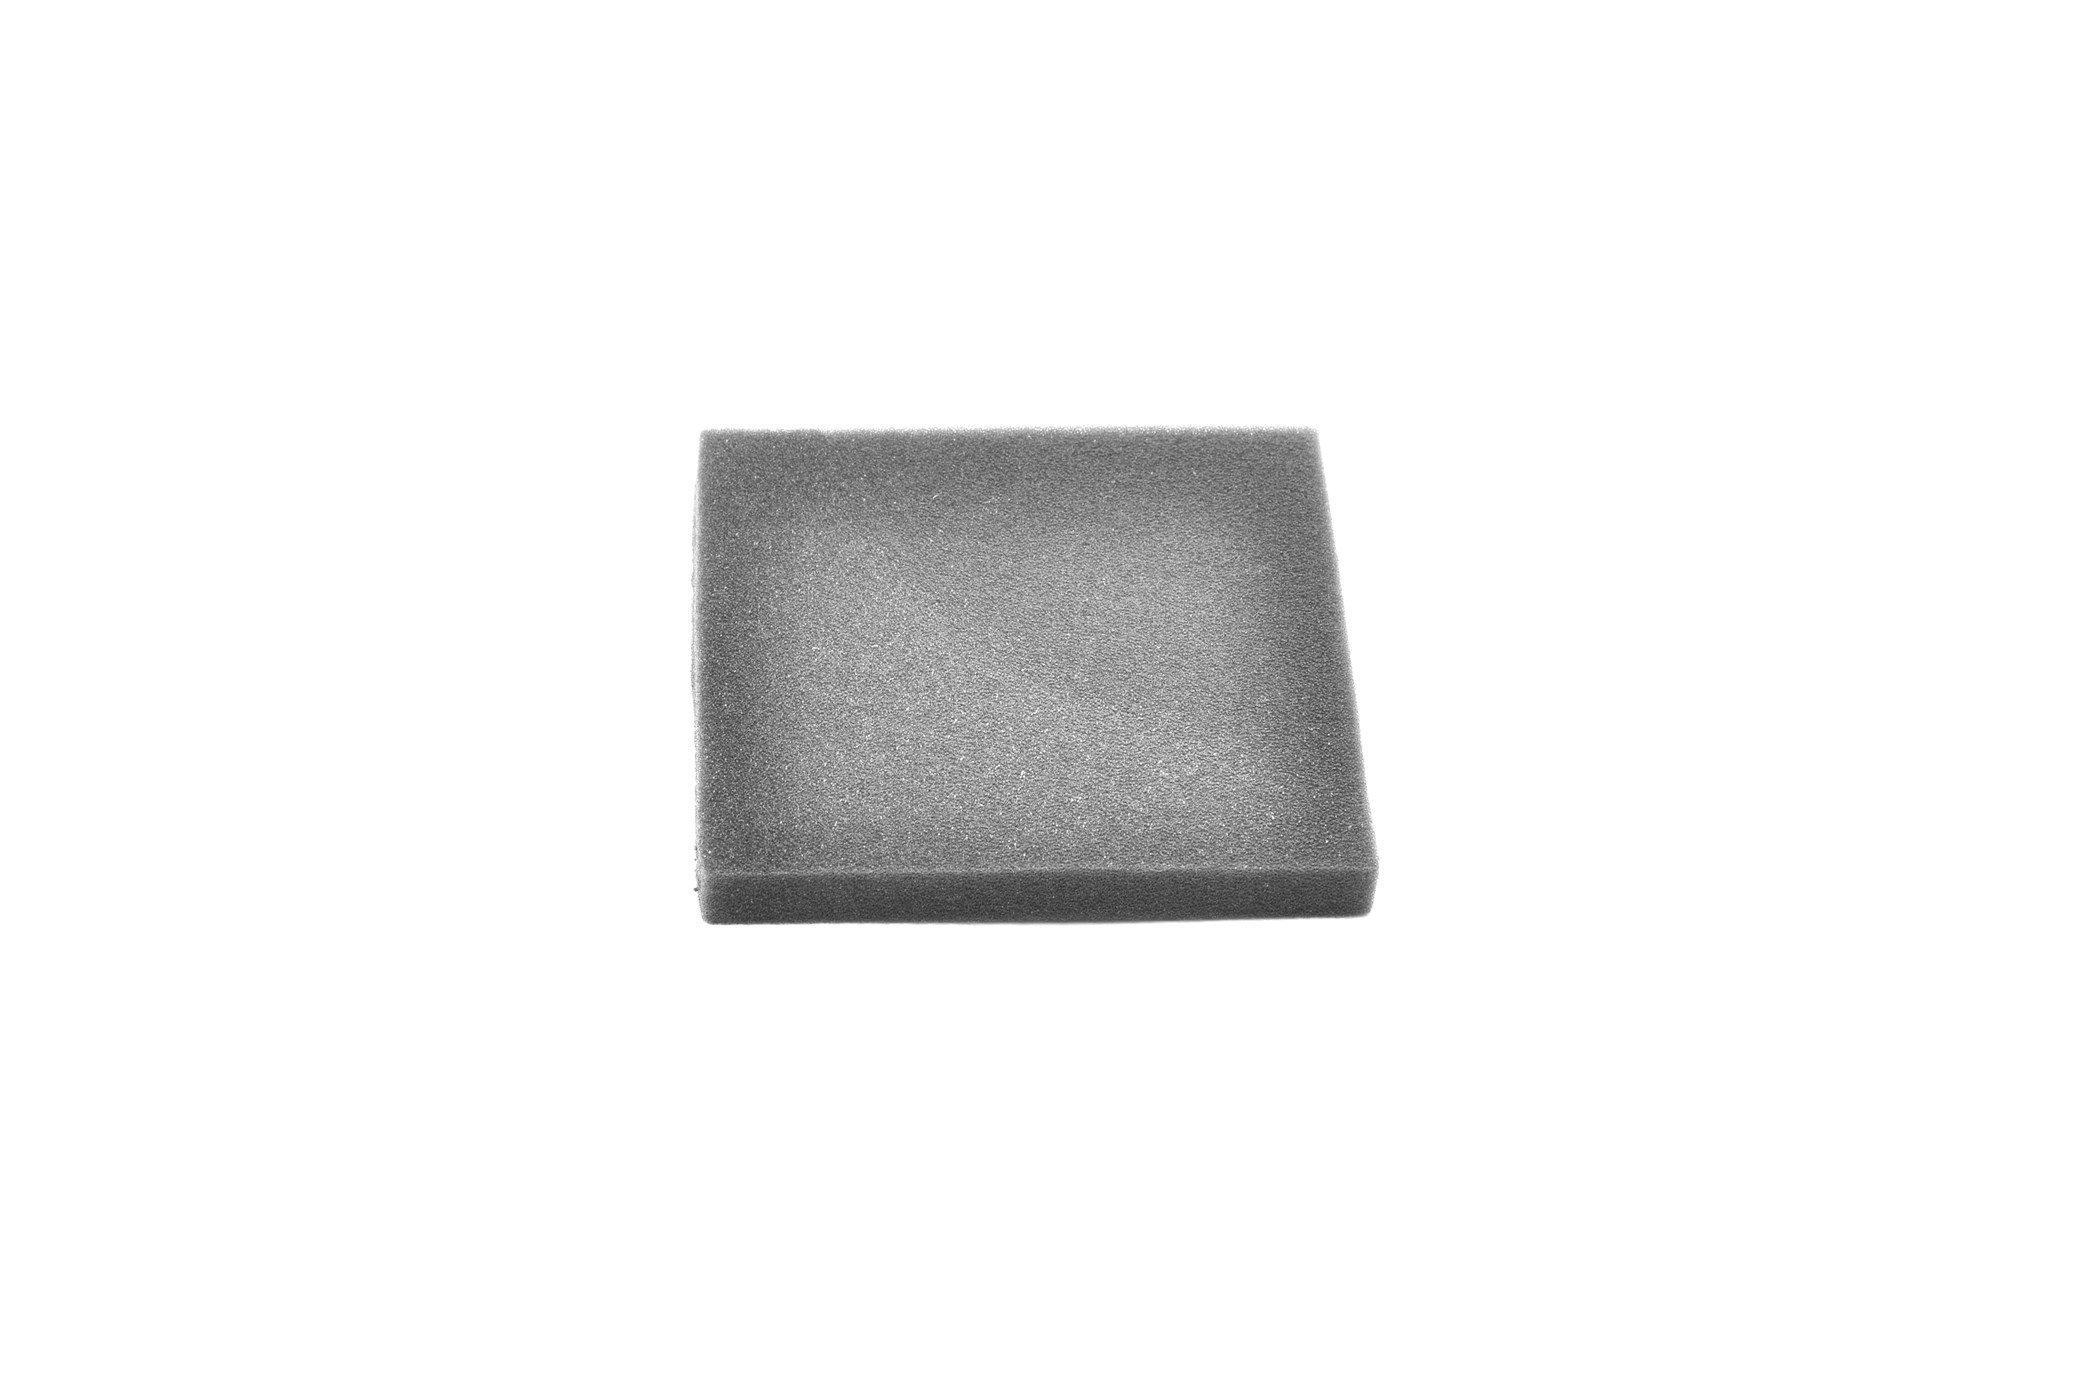 Primary Filter Foam